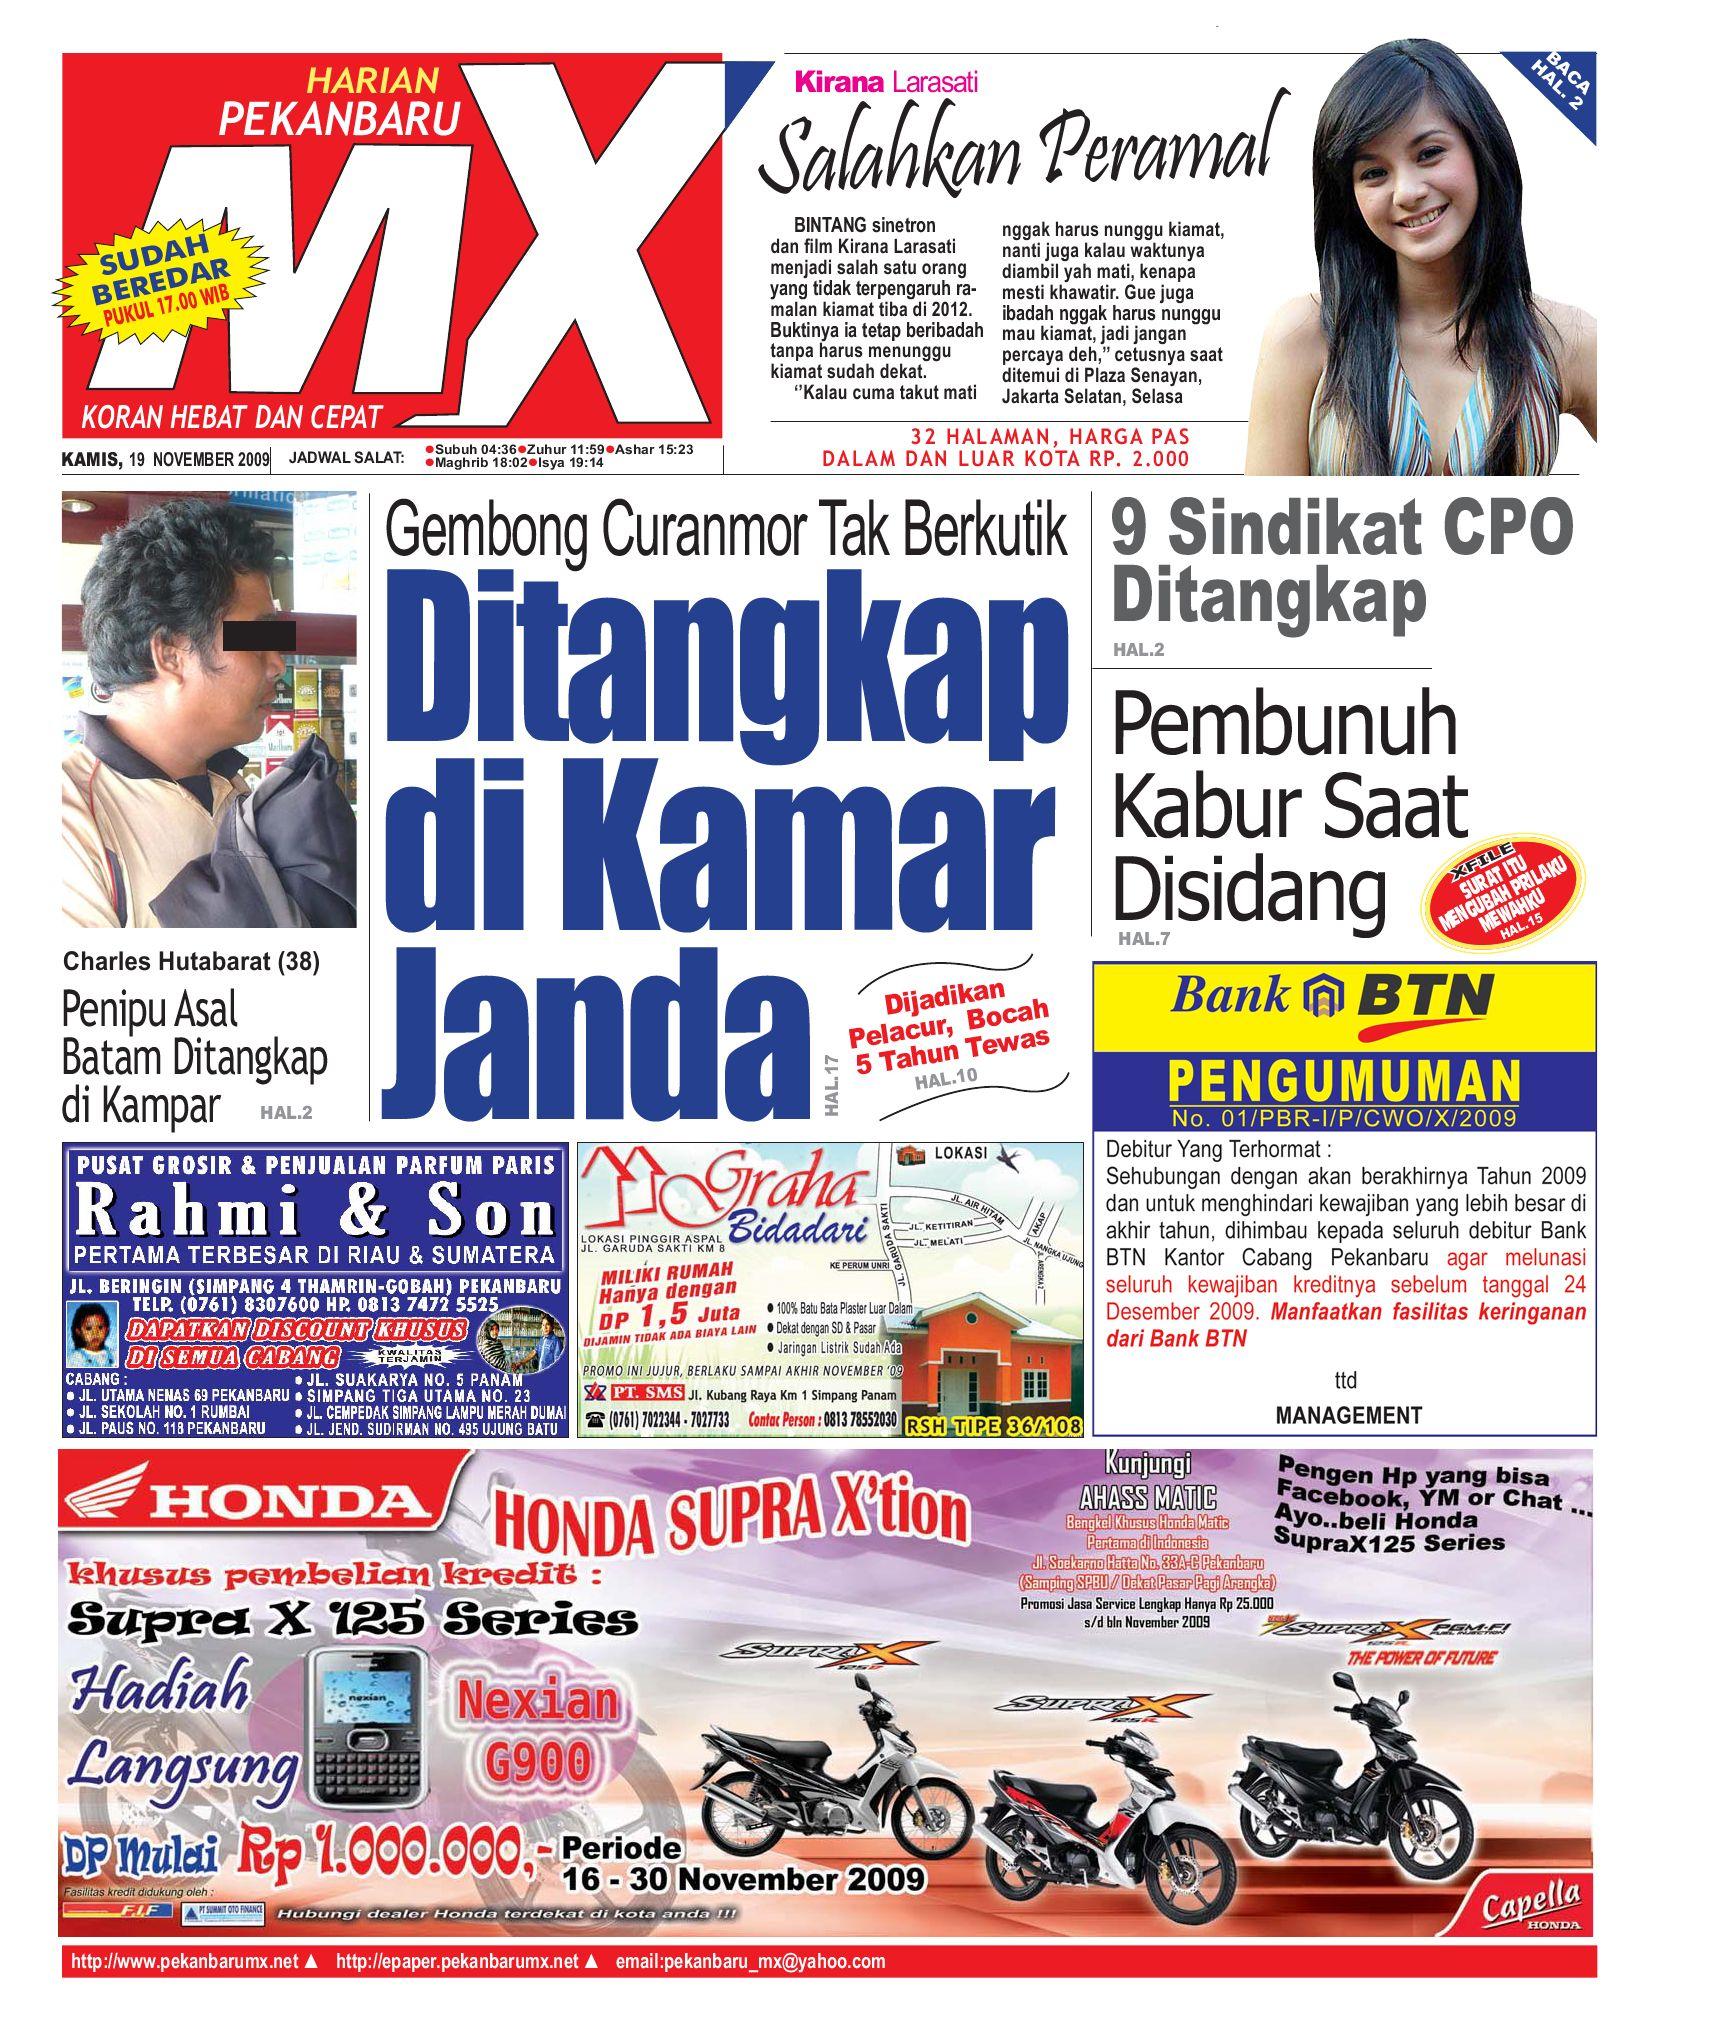 Pekanbarumx By Riau Issuu Doveamp039s Furniture Meja Rias Mr 006 Free Ongkir Jawa Bali